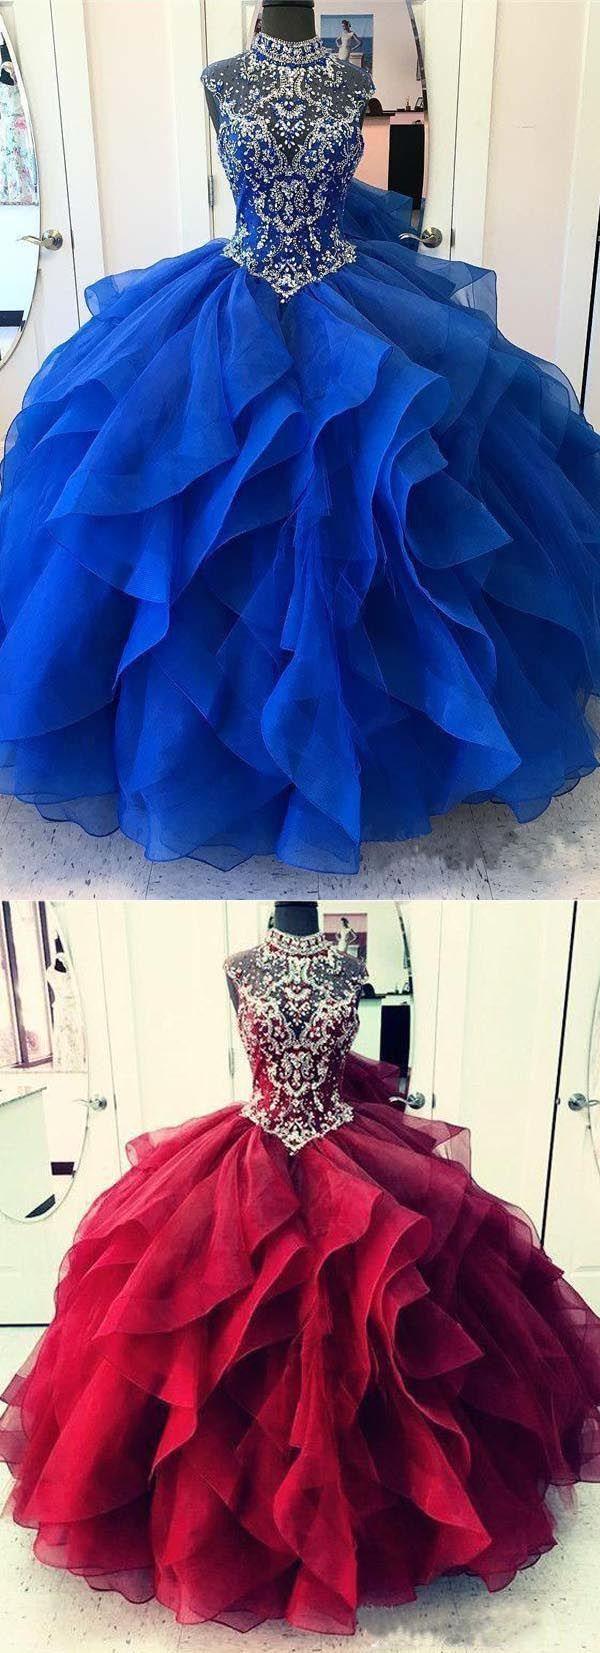 Royal blue organza high neck quinceanera dresses prom dress pg